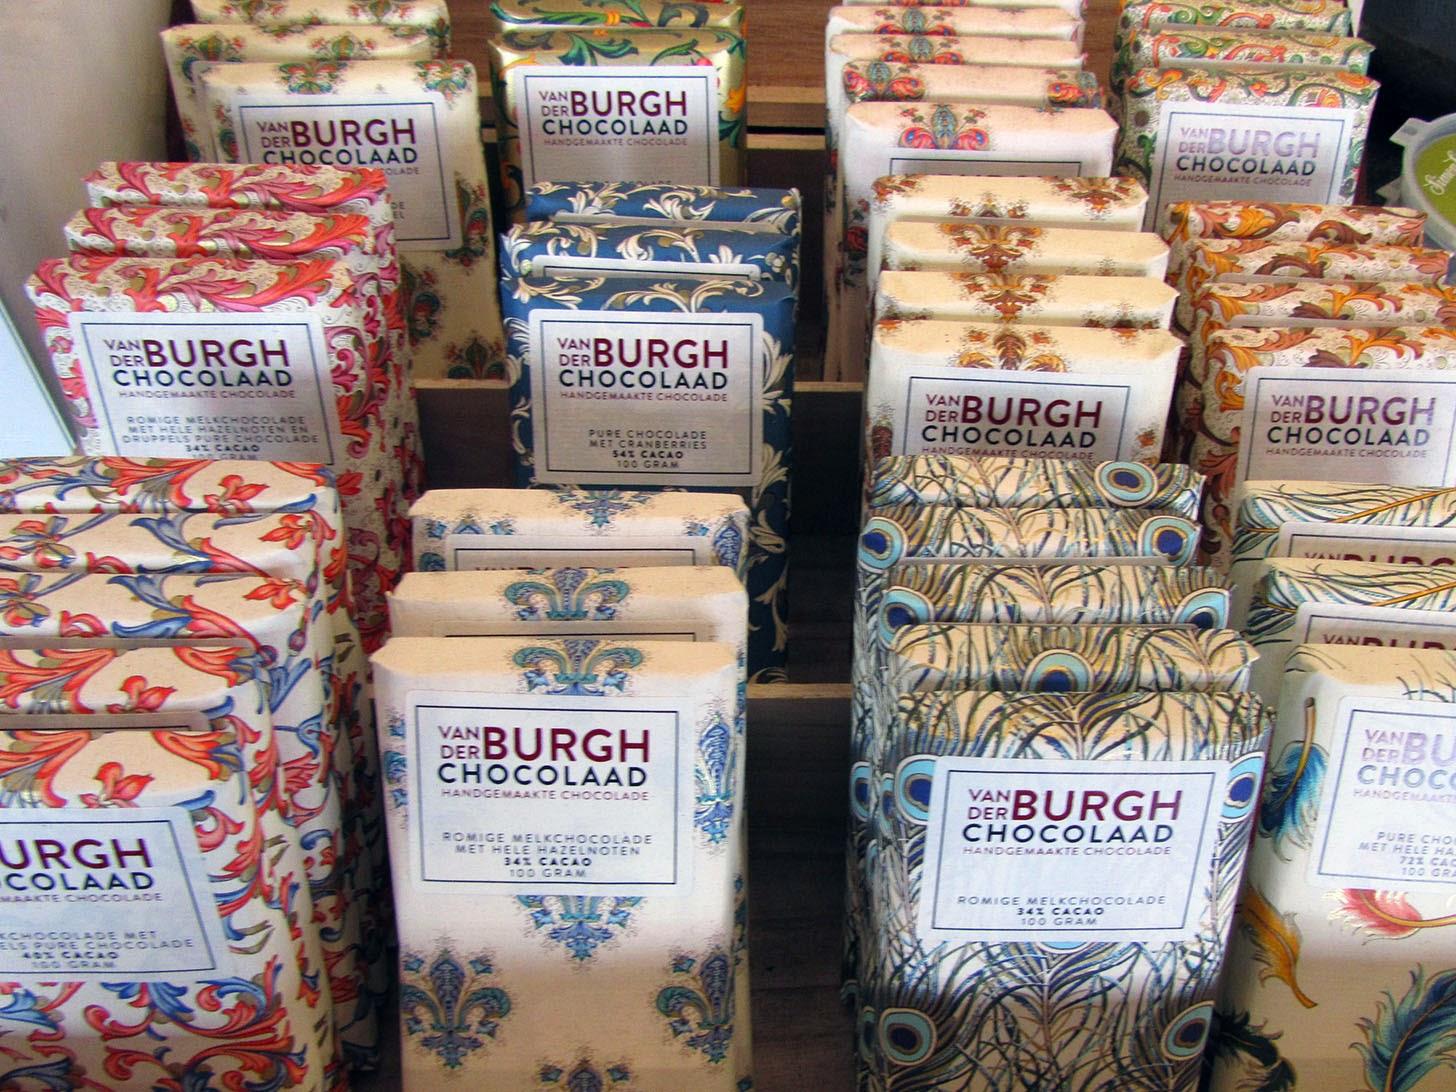 van den Burgh chocolaad, chocolate